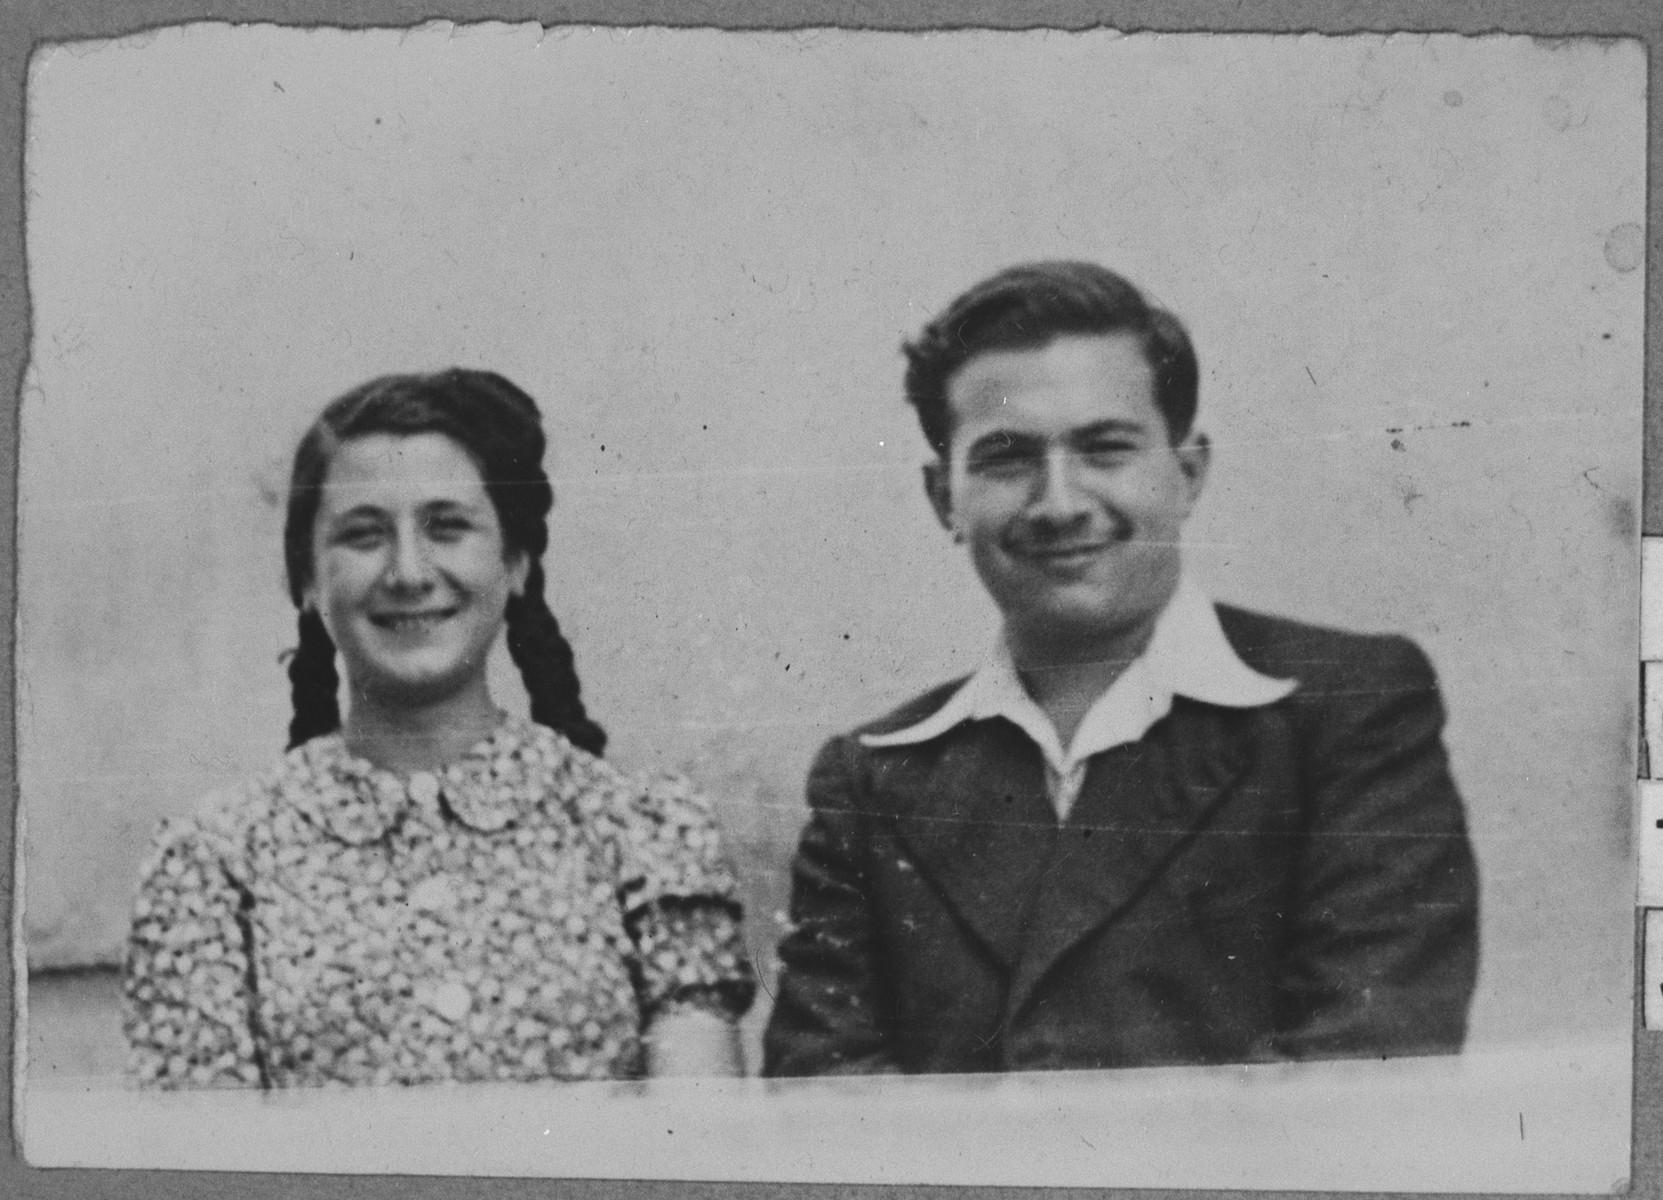 Portrait of Isak Faradji, son of David Faradji, and Rebeka Faradji, daughter of David Faradji.  They were students.  They lived at Alimpika 12 in Bitola.